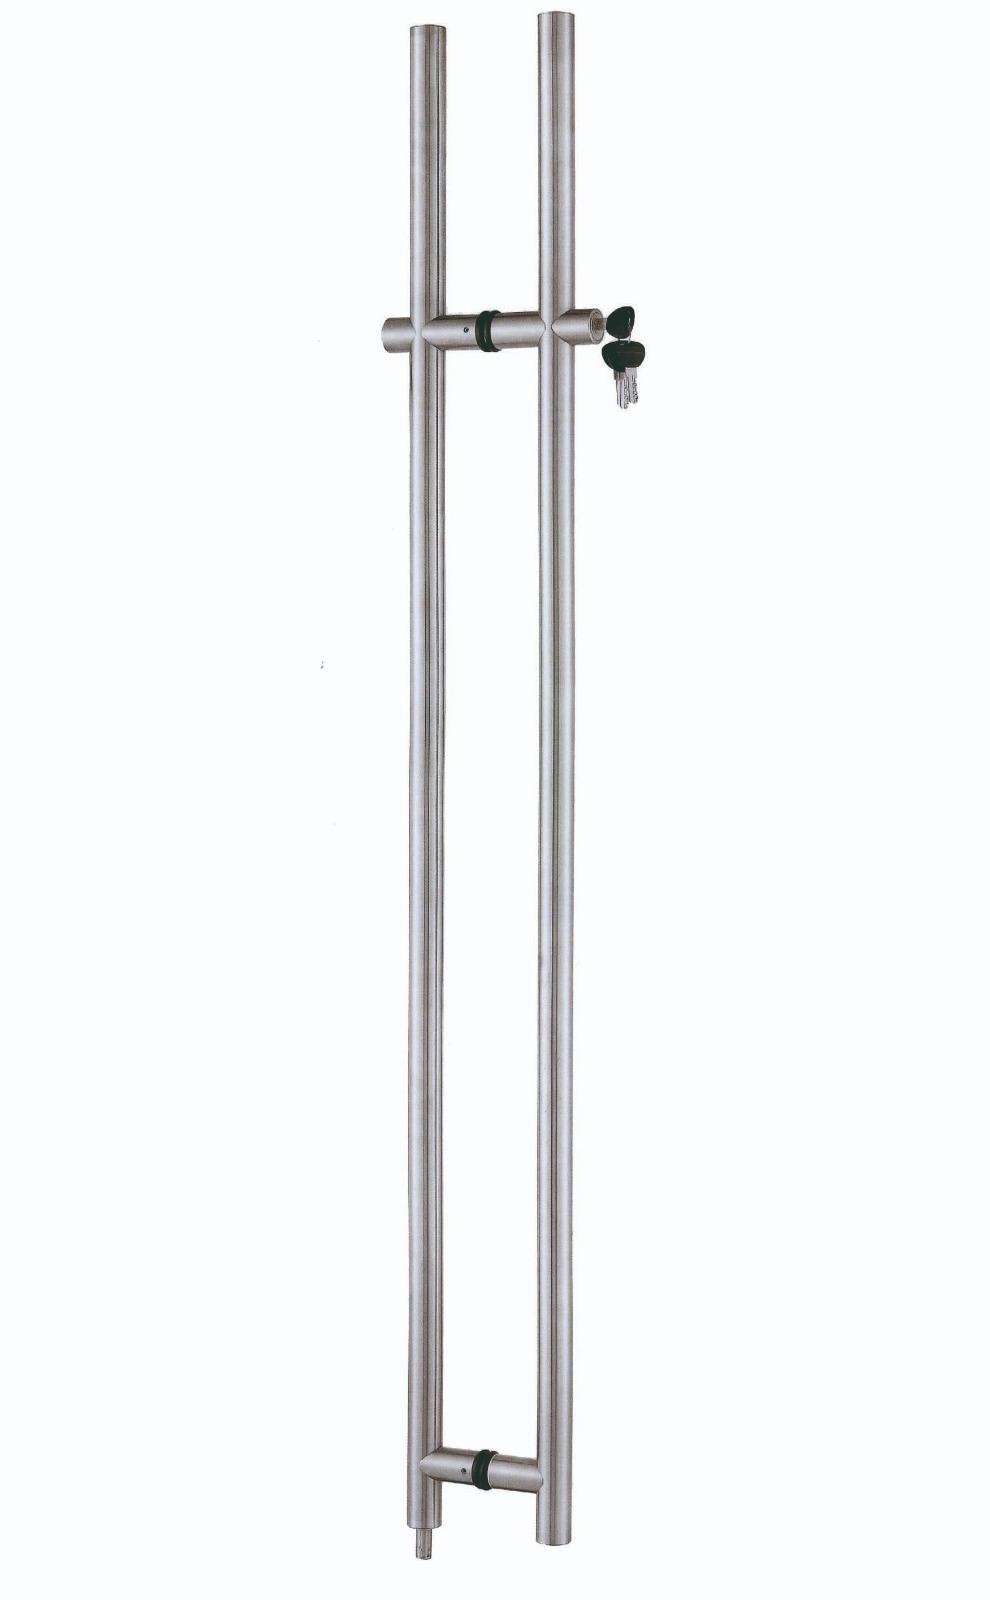 BM-HK1500 – Zemine Kilitli Boru Kol